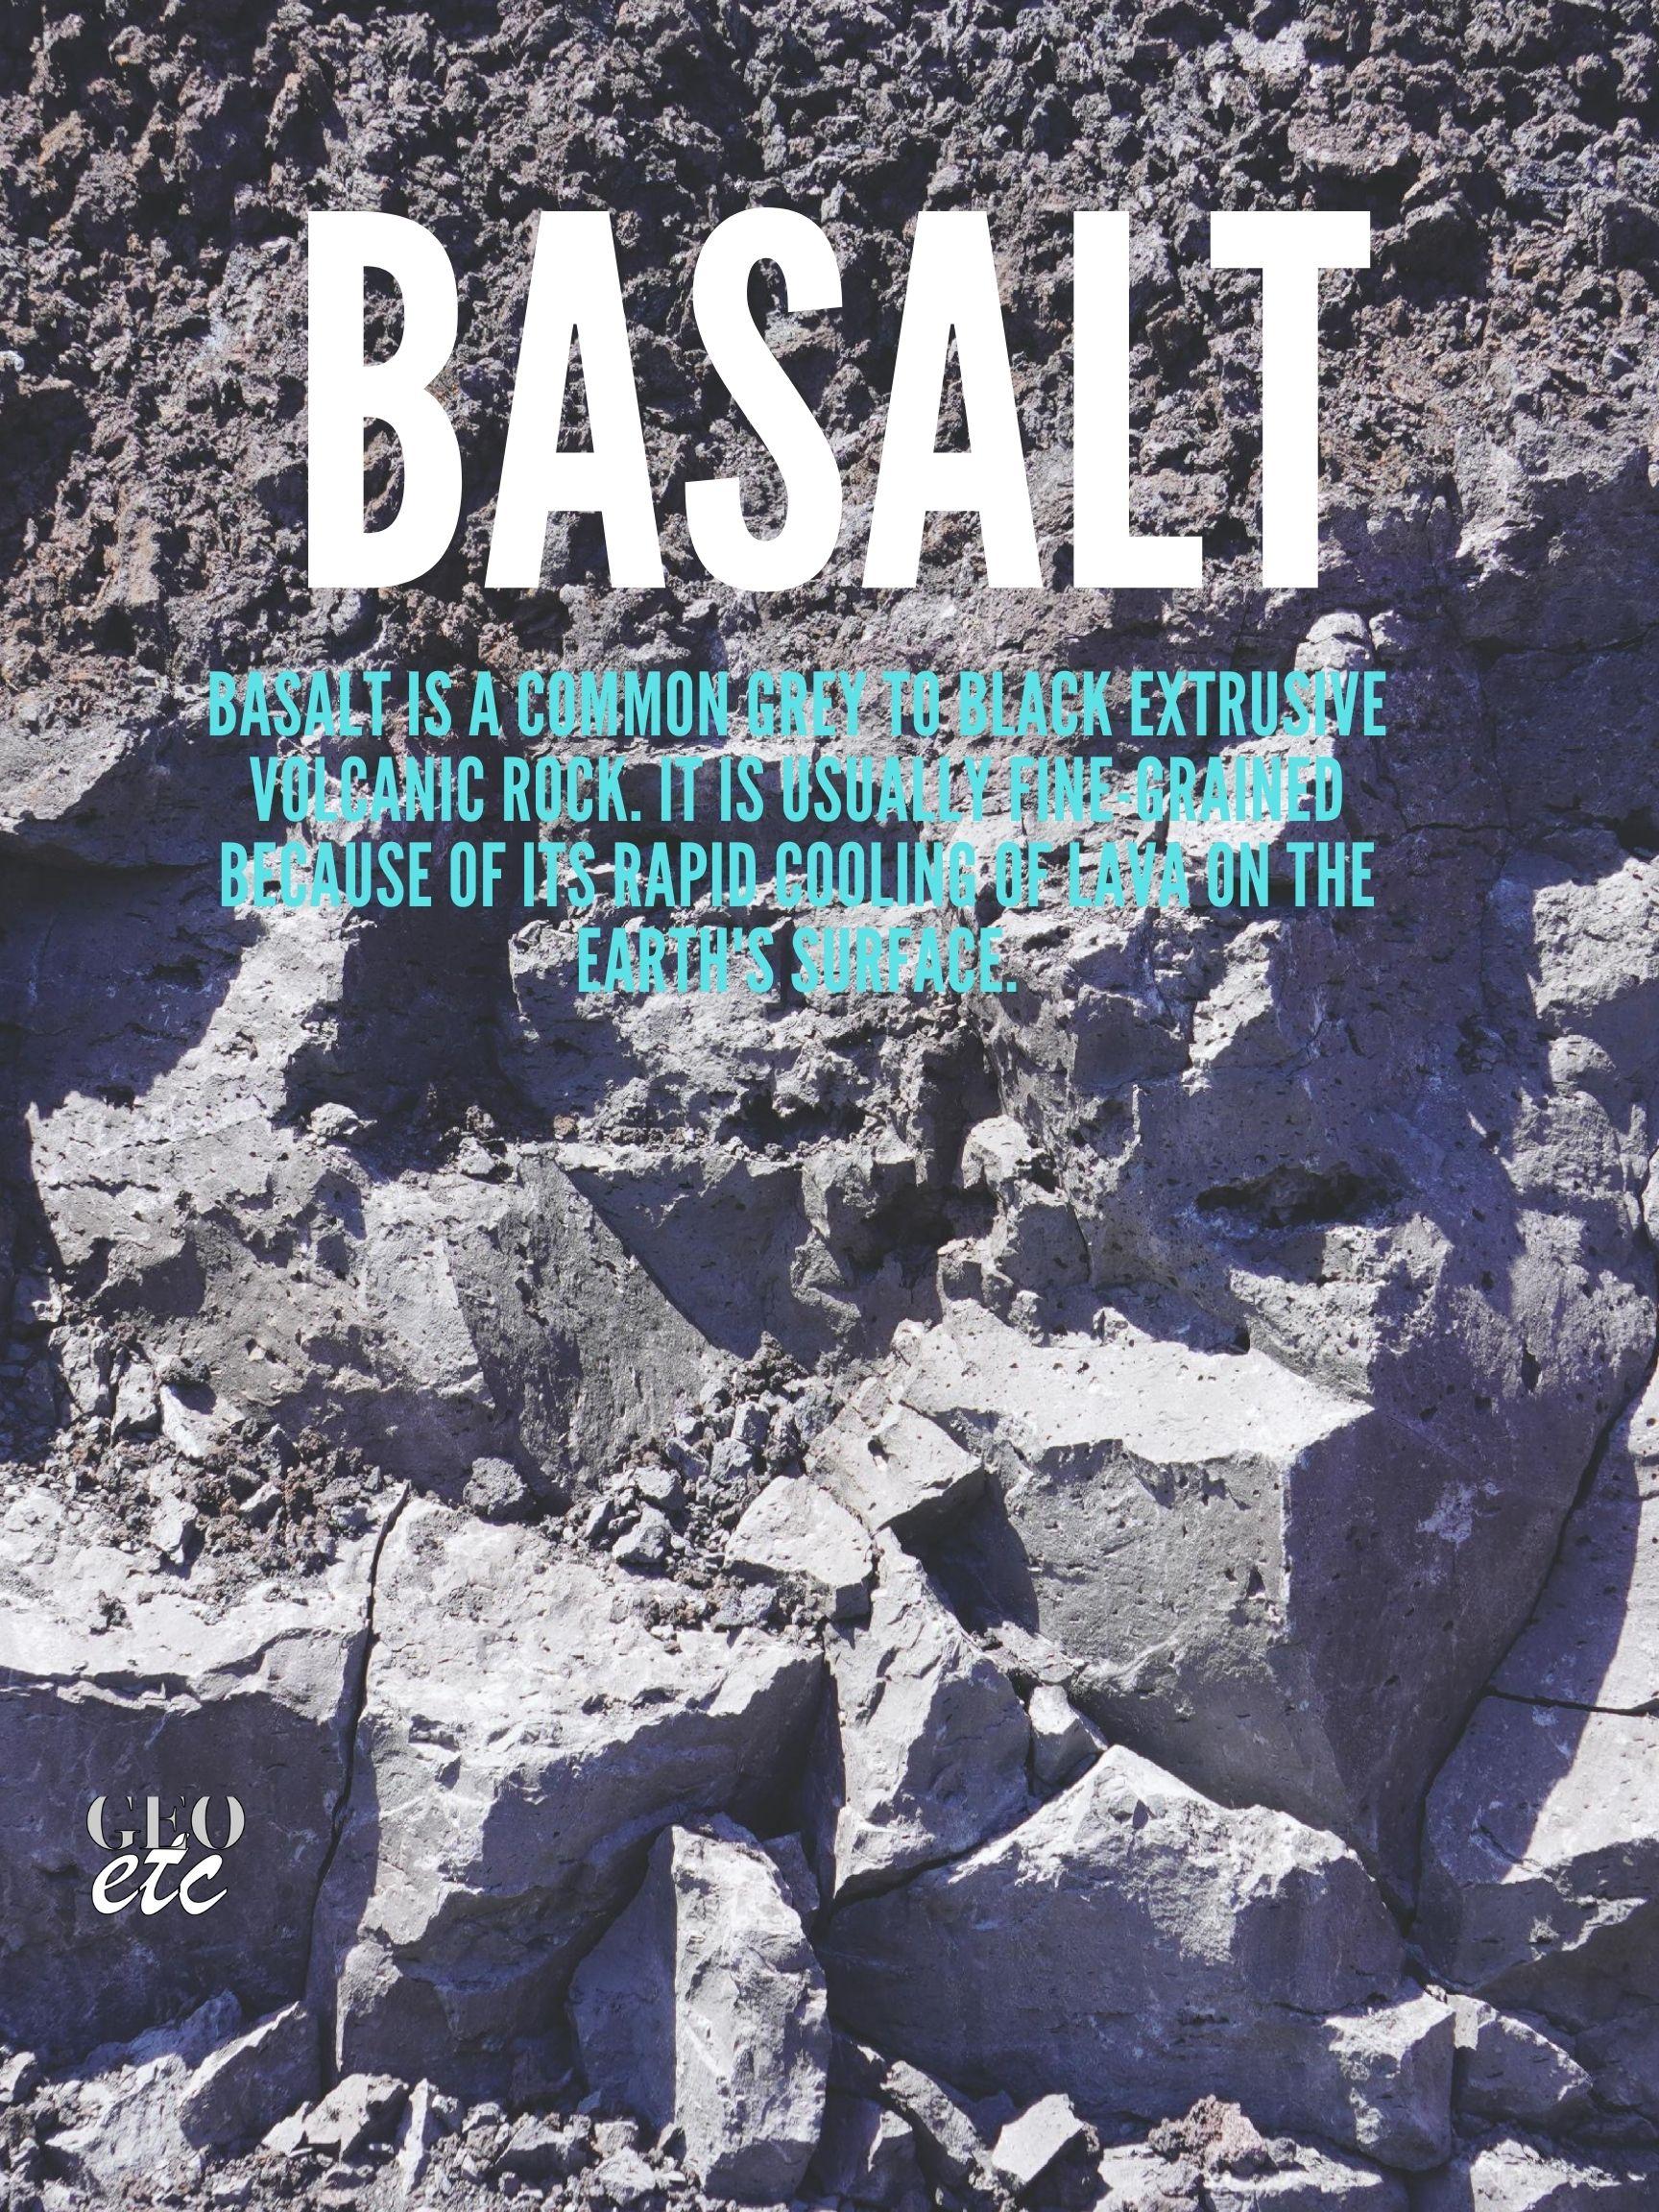 Basalt Poster